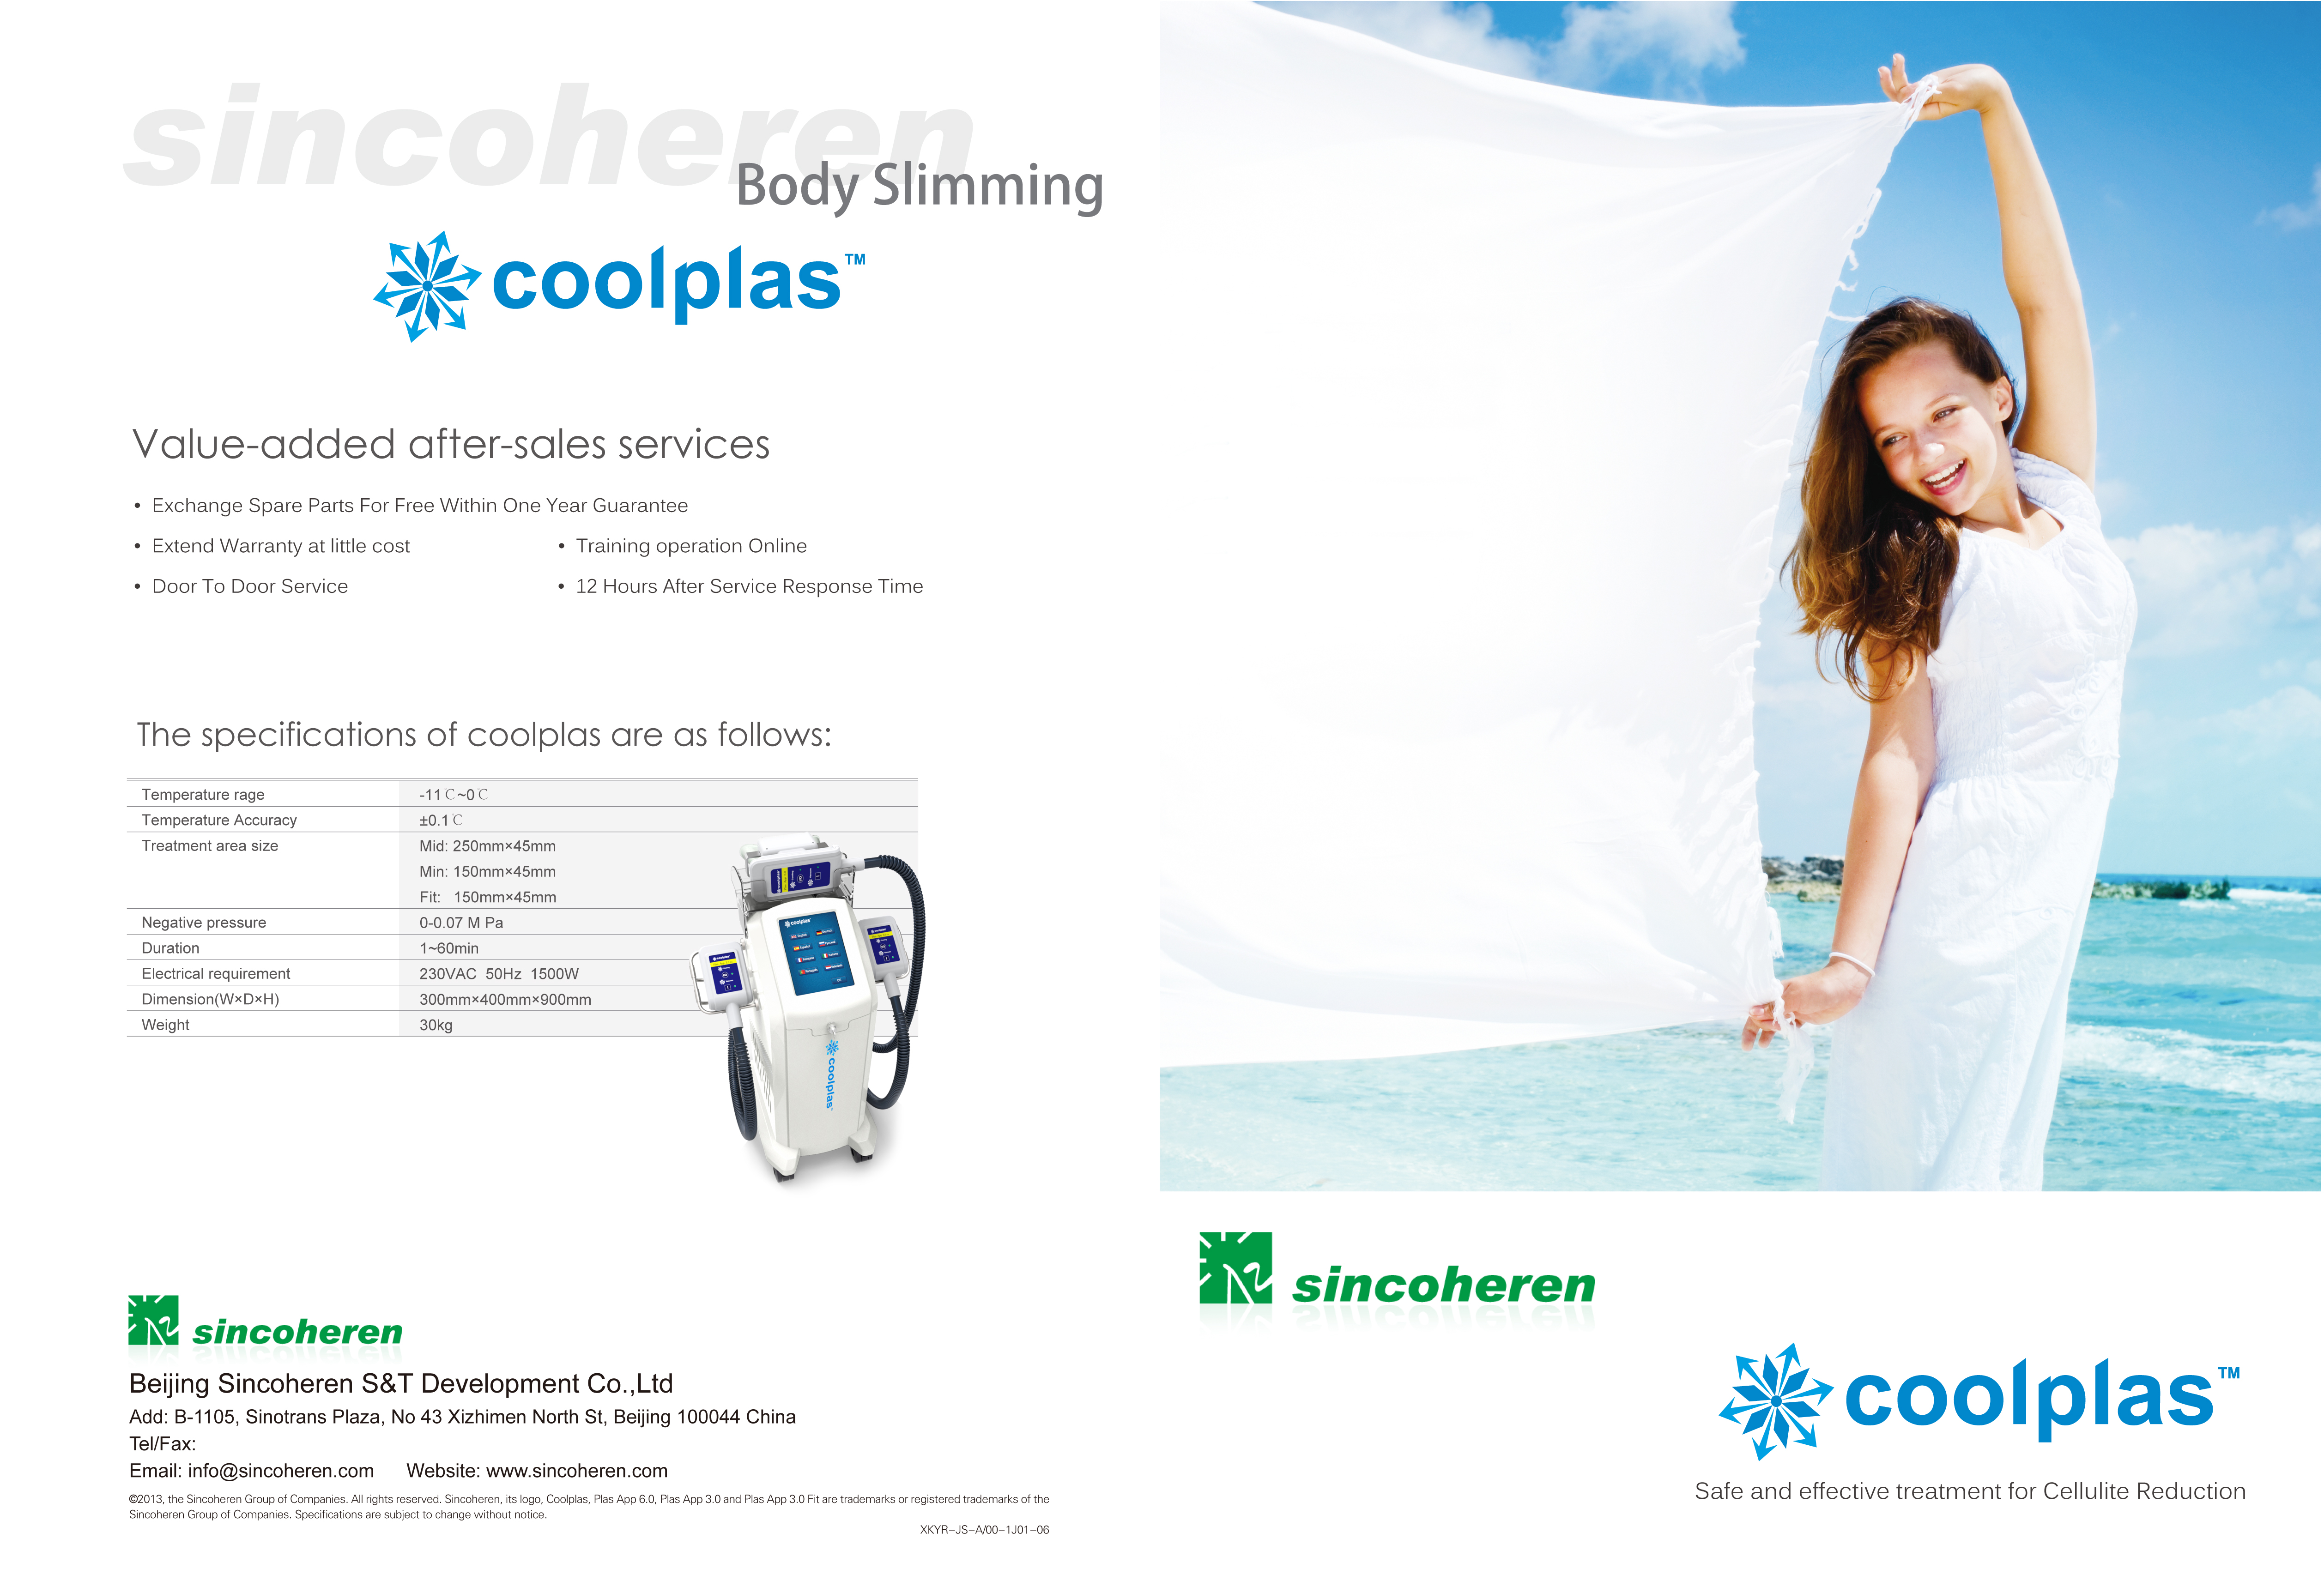 coolplas-1